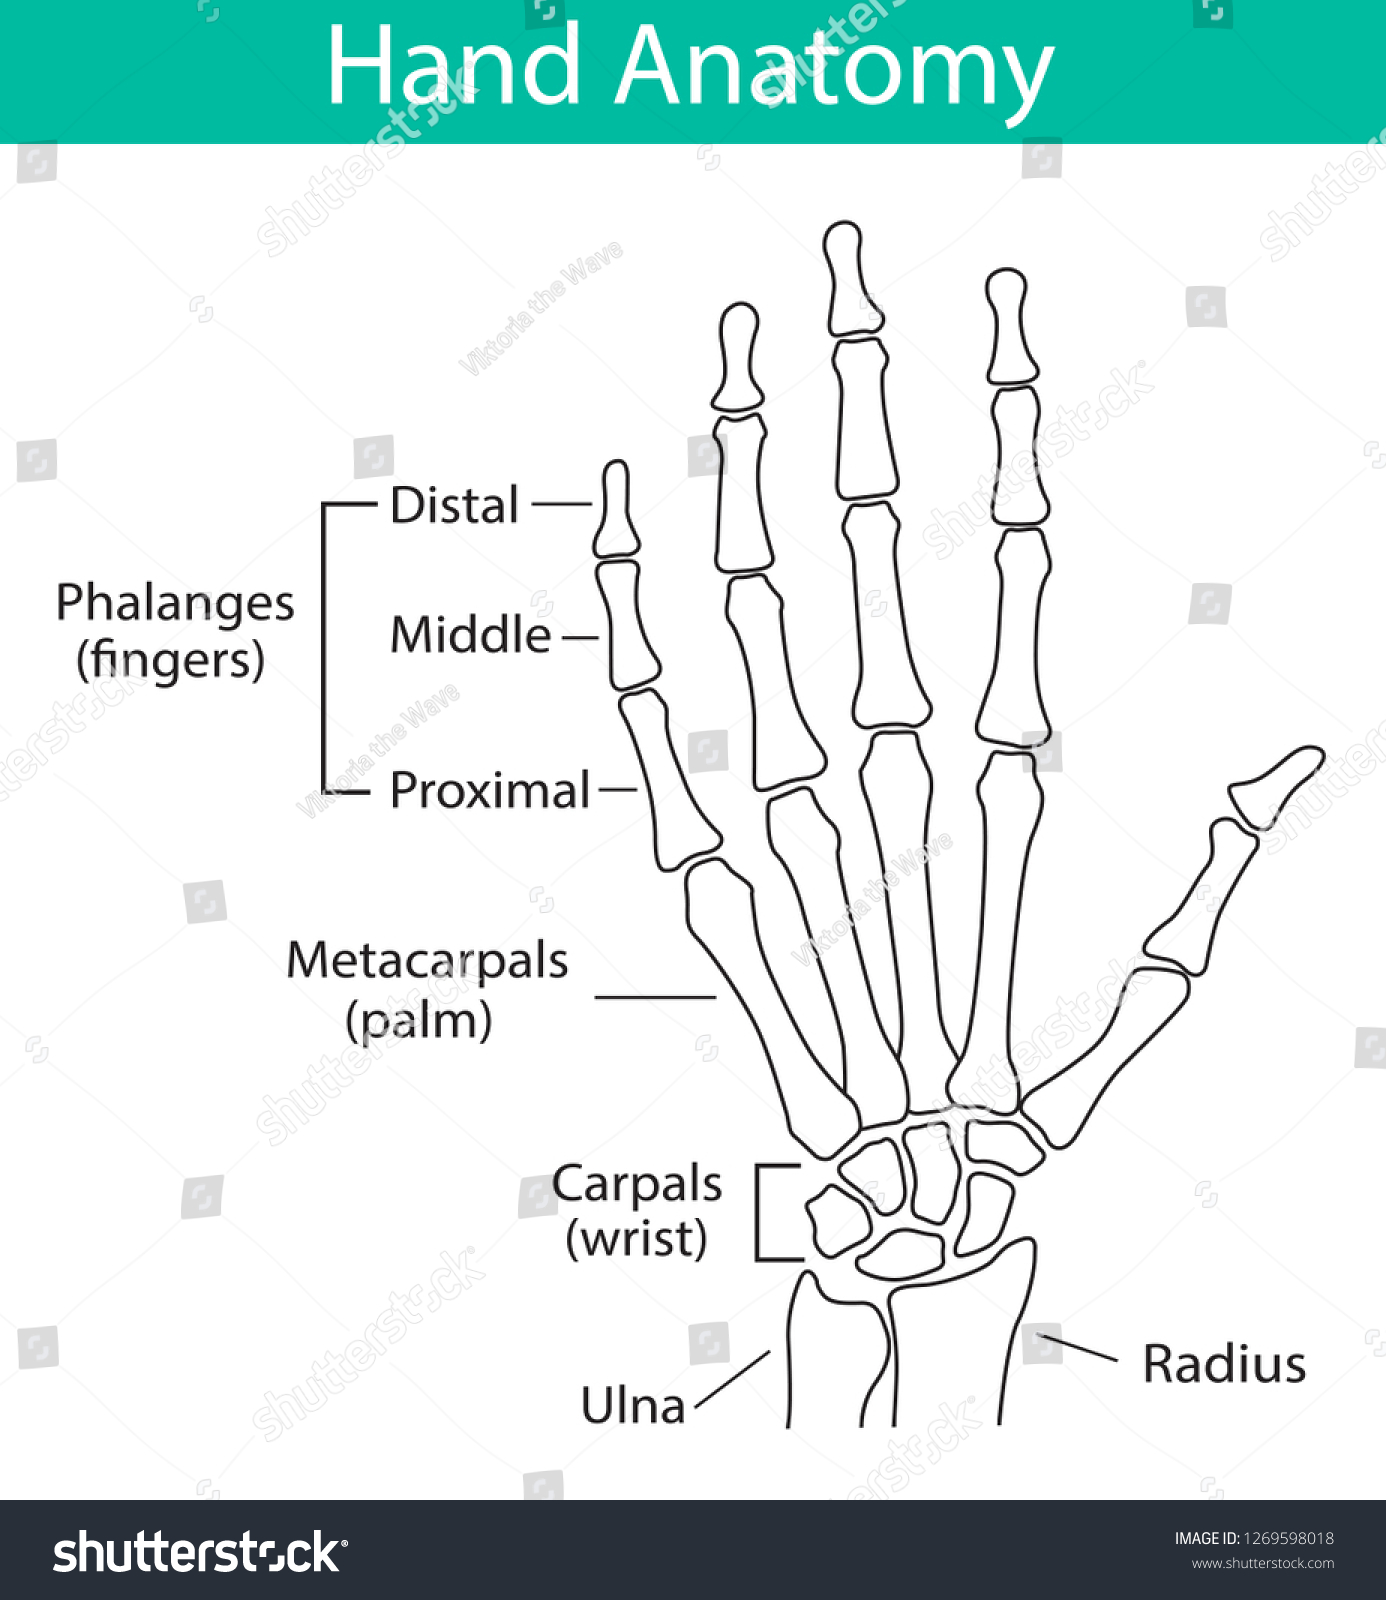 hight resolution of vector illustration of human hand skeletal anatomy bone structure diagram educational materials medical